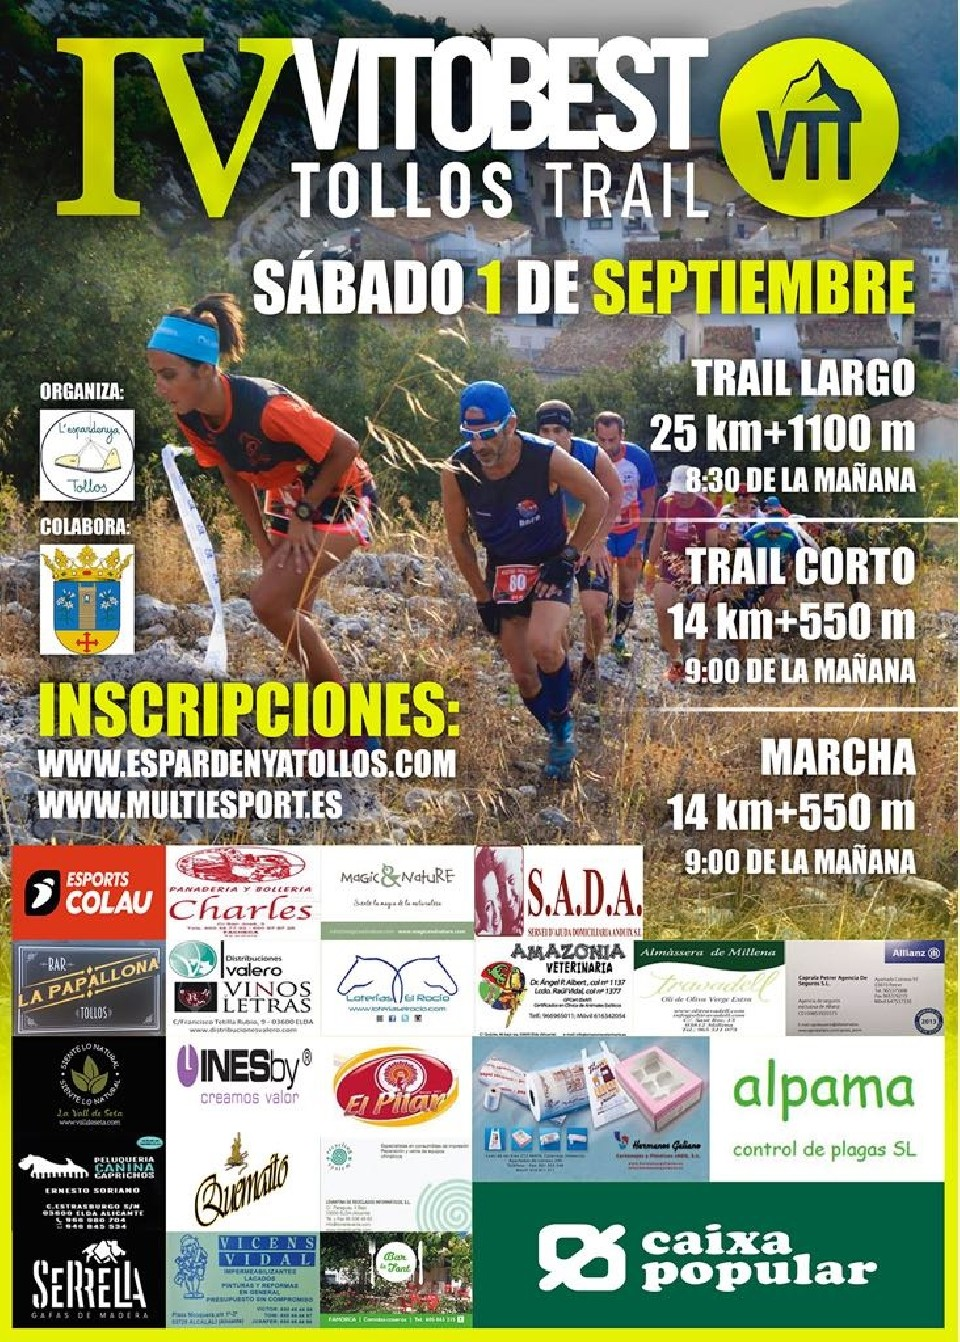 IV Vitobest Tollos Trail